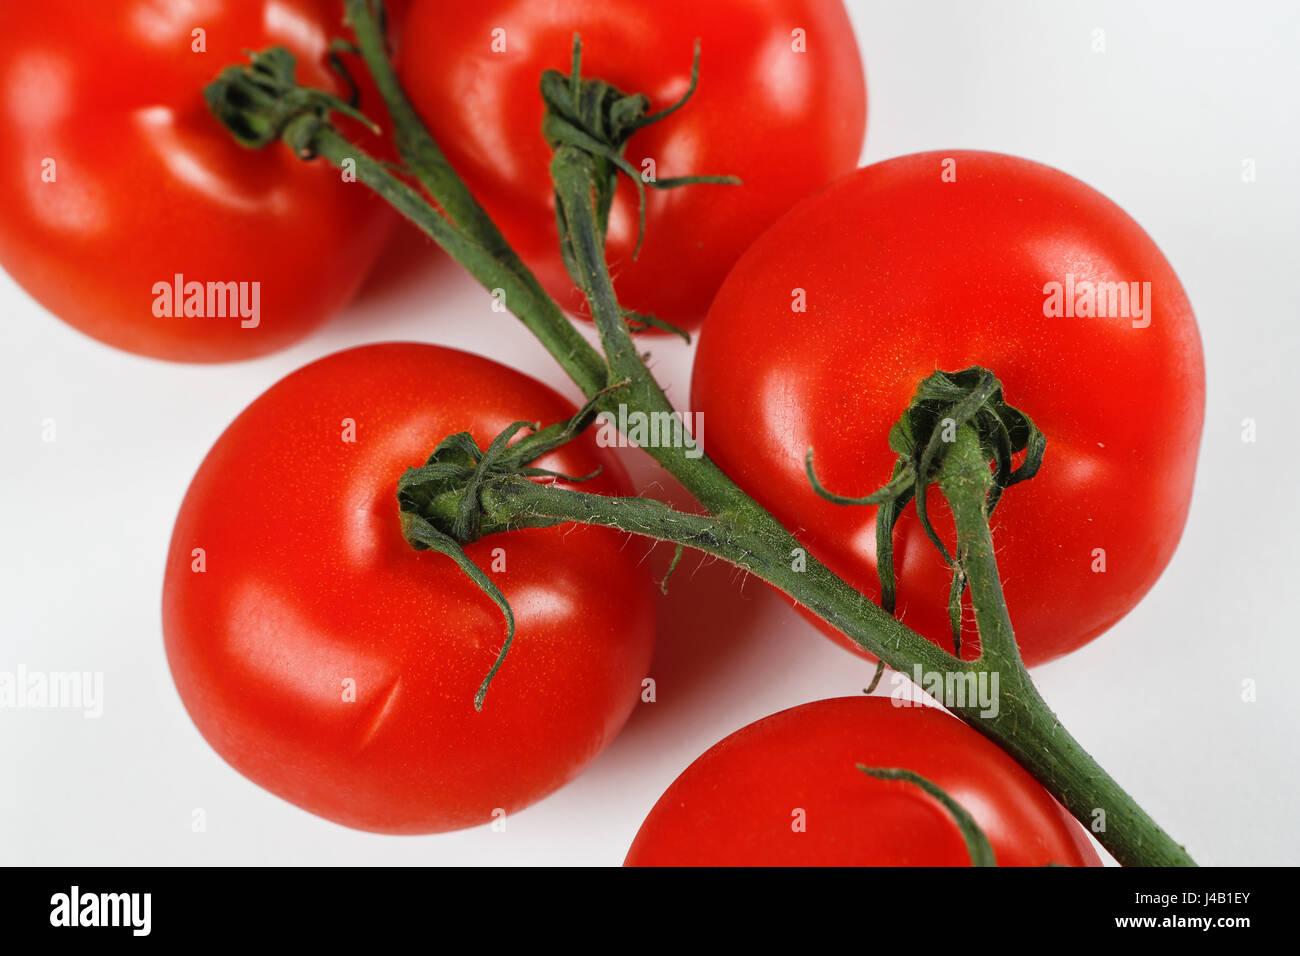 Organic tomatoes. Food concepts. Tomatoes. Illustrative Stock Photo